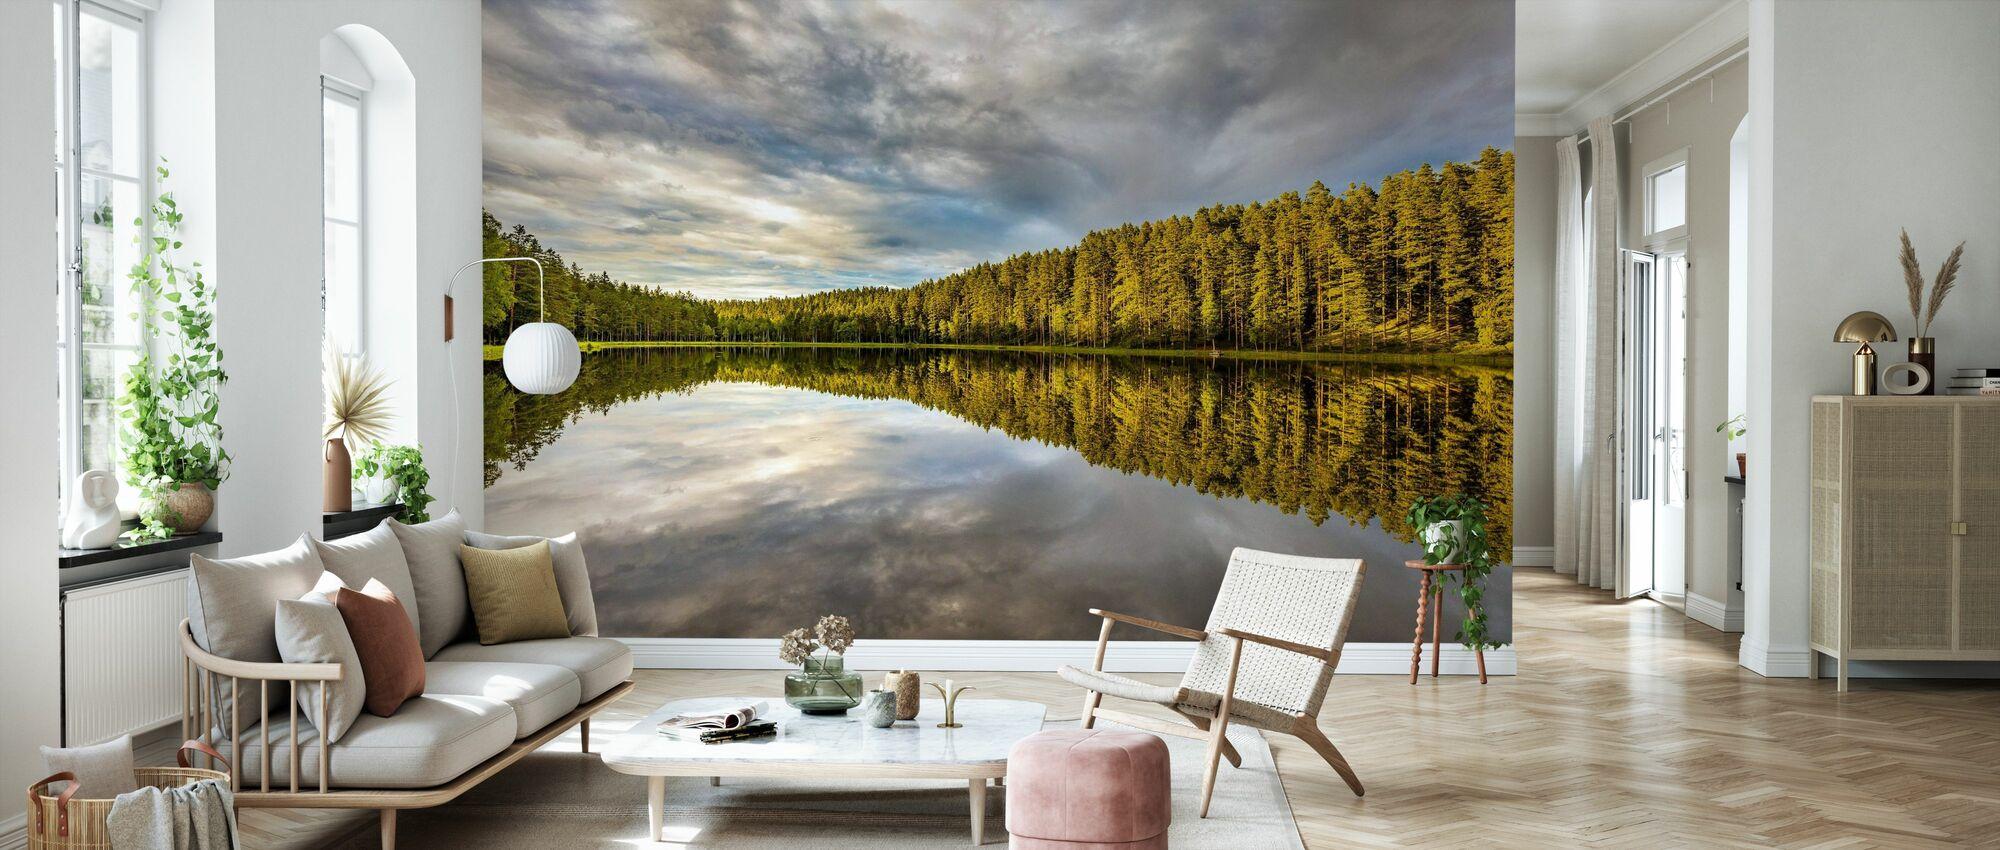 Sommarsjö 5 - Tapet - Vardagsrum